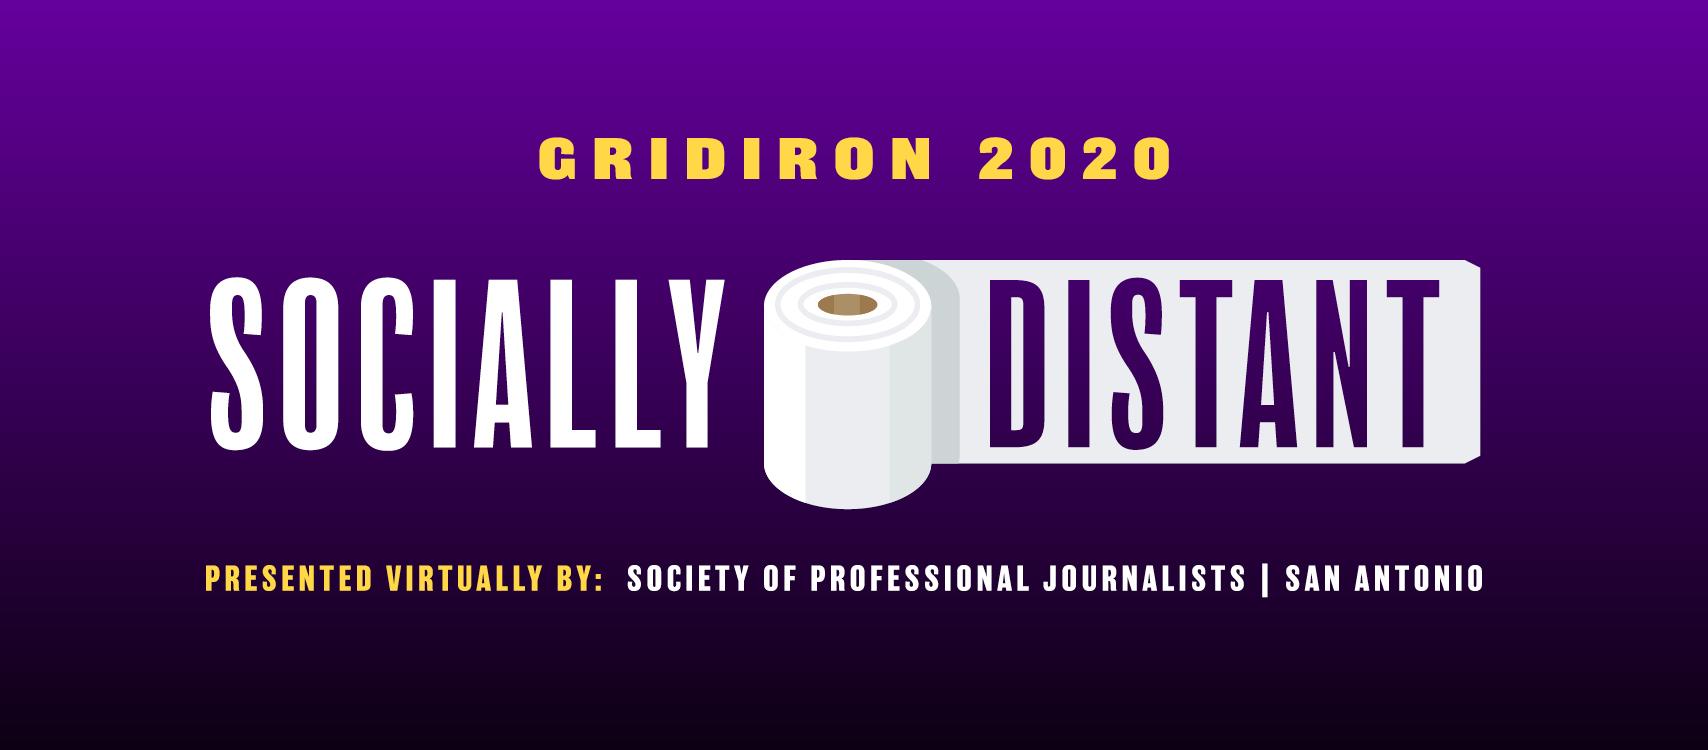 Gridiron_2020_Social_Media820x360